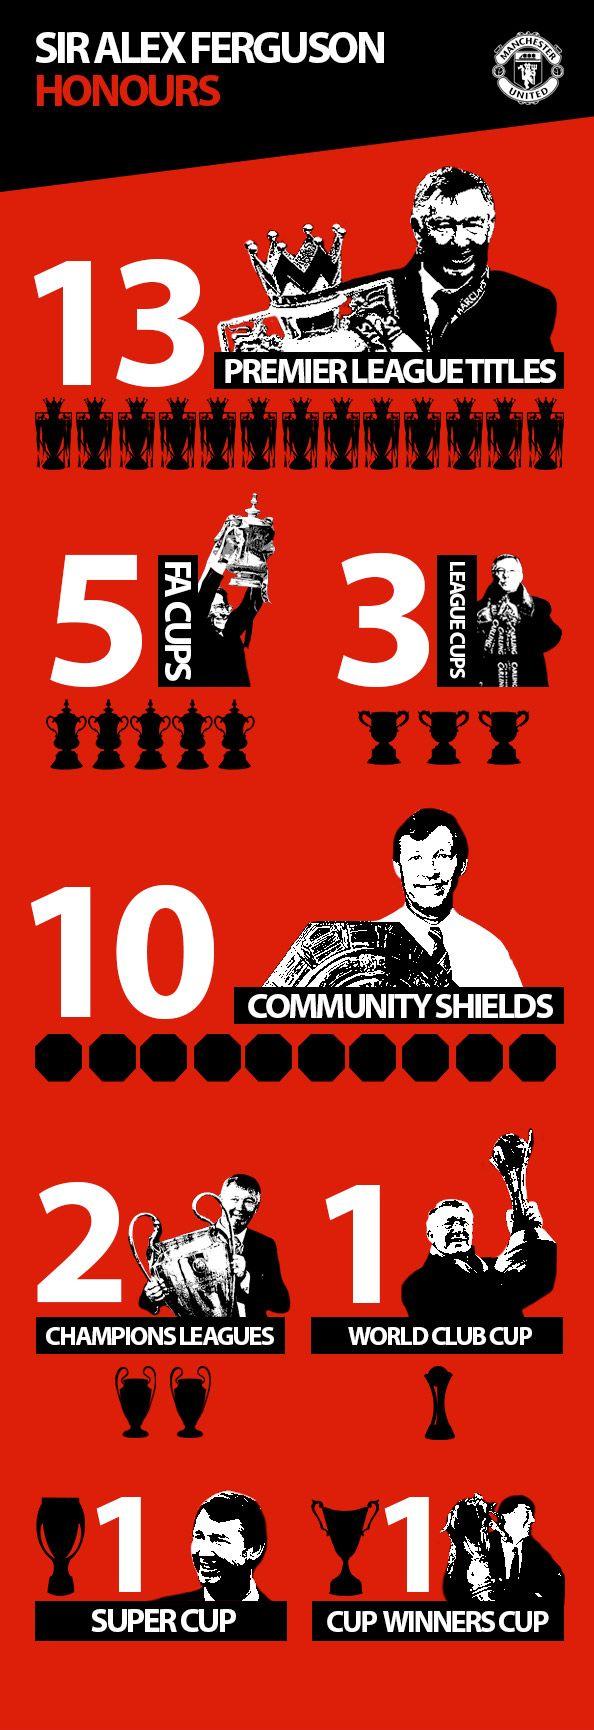 Sir Alex Ferguson's honours